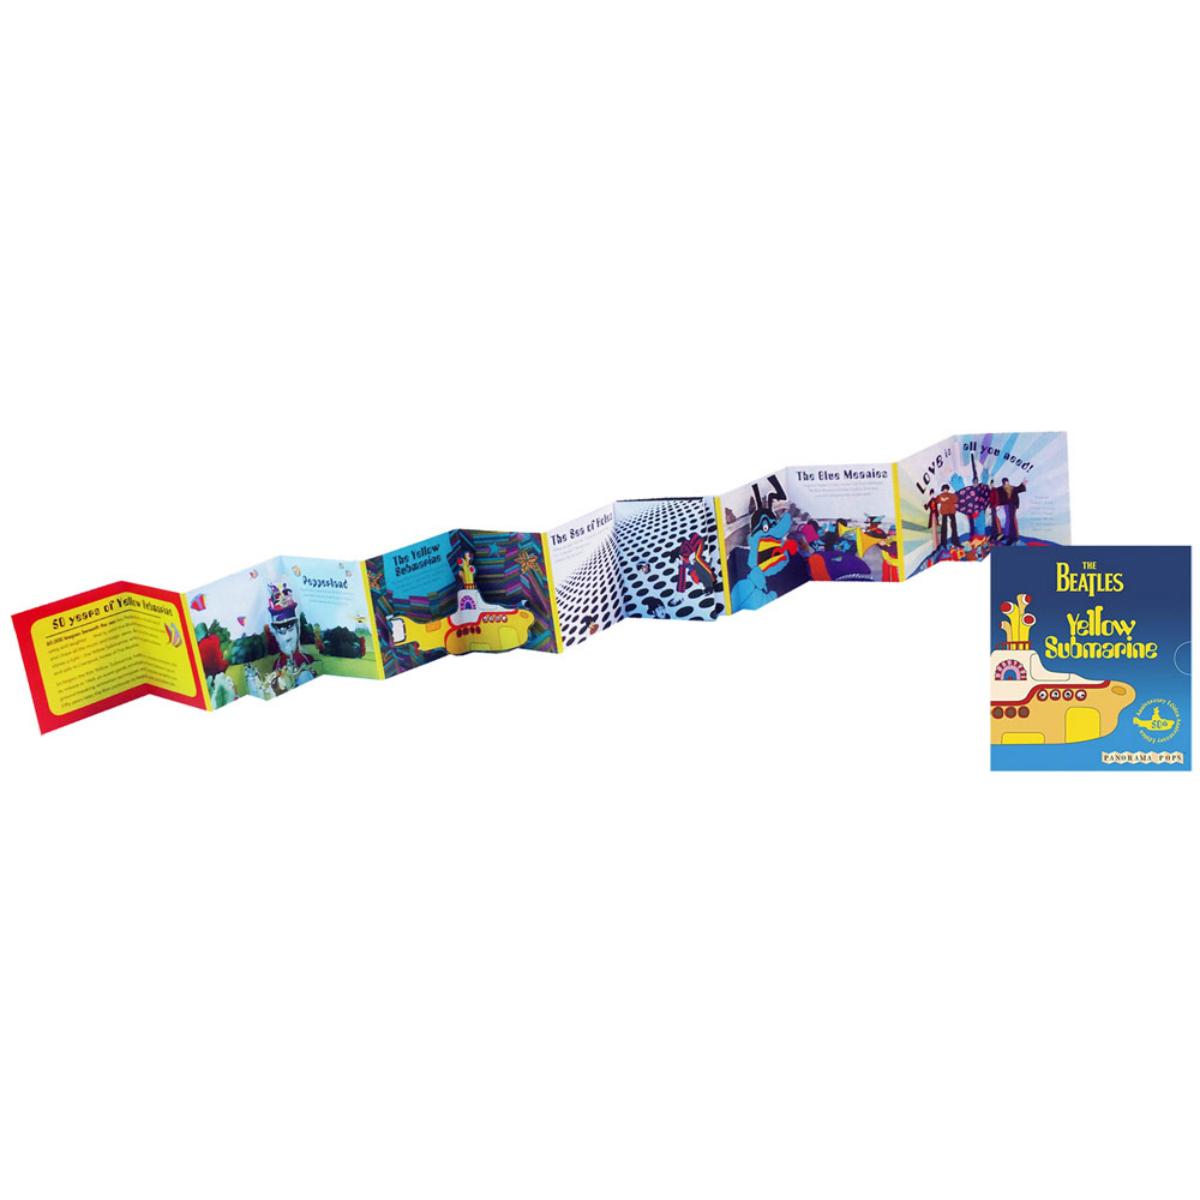 Yellow Submarine 50th Edition Pop Up Book